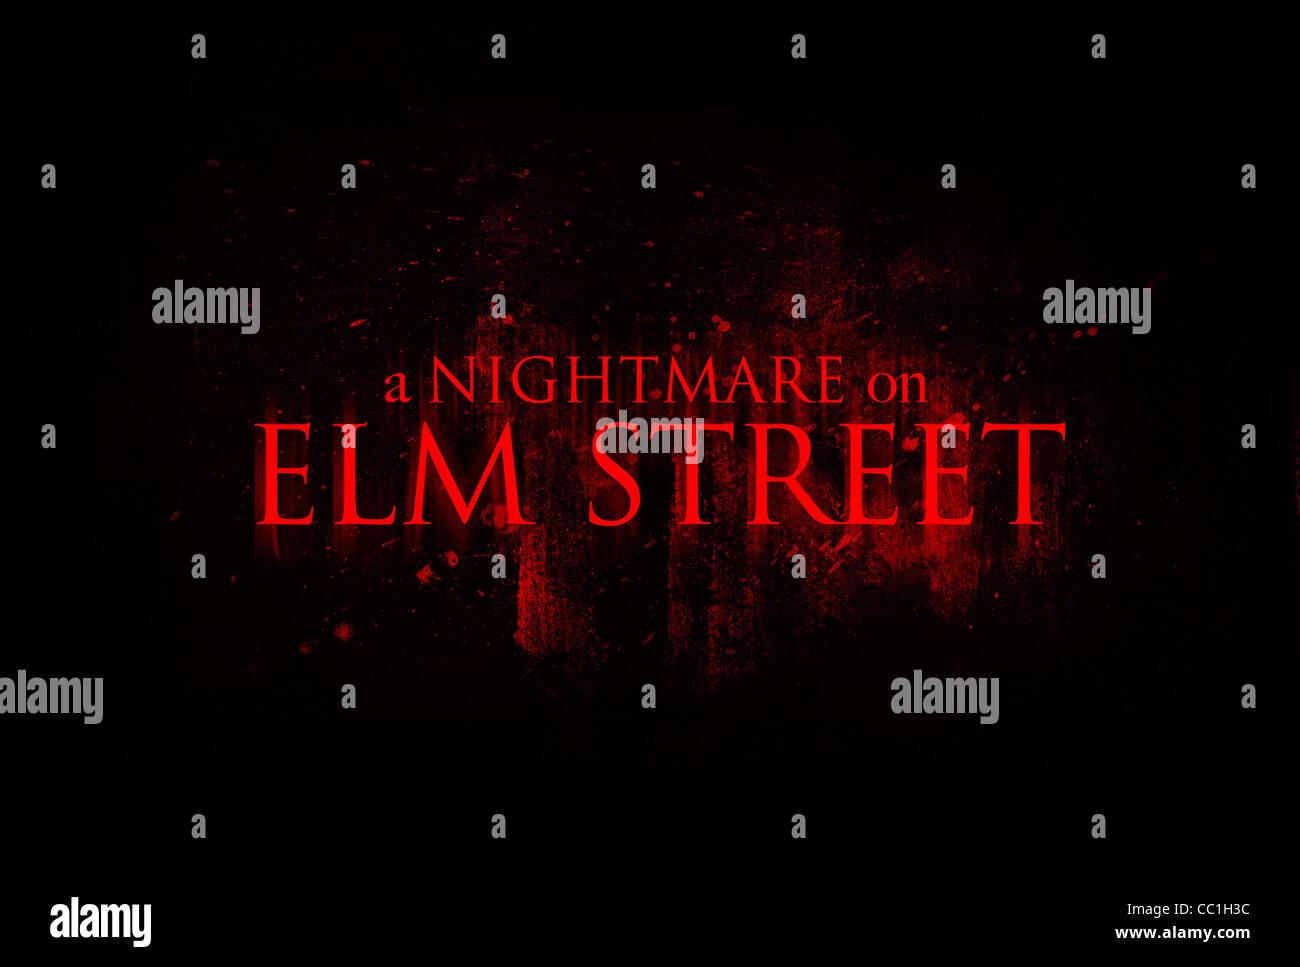 movie poster a nightmare on elm street 2010 stock photo